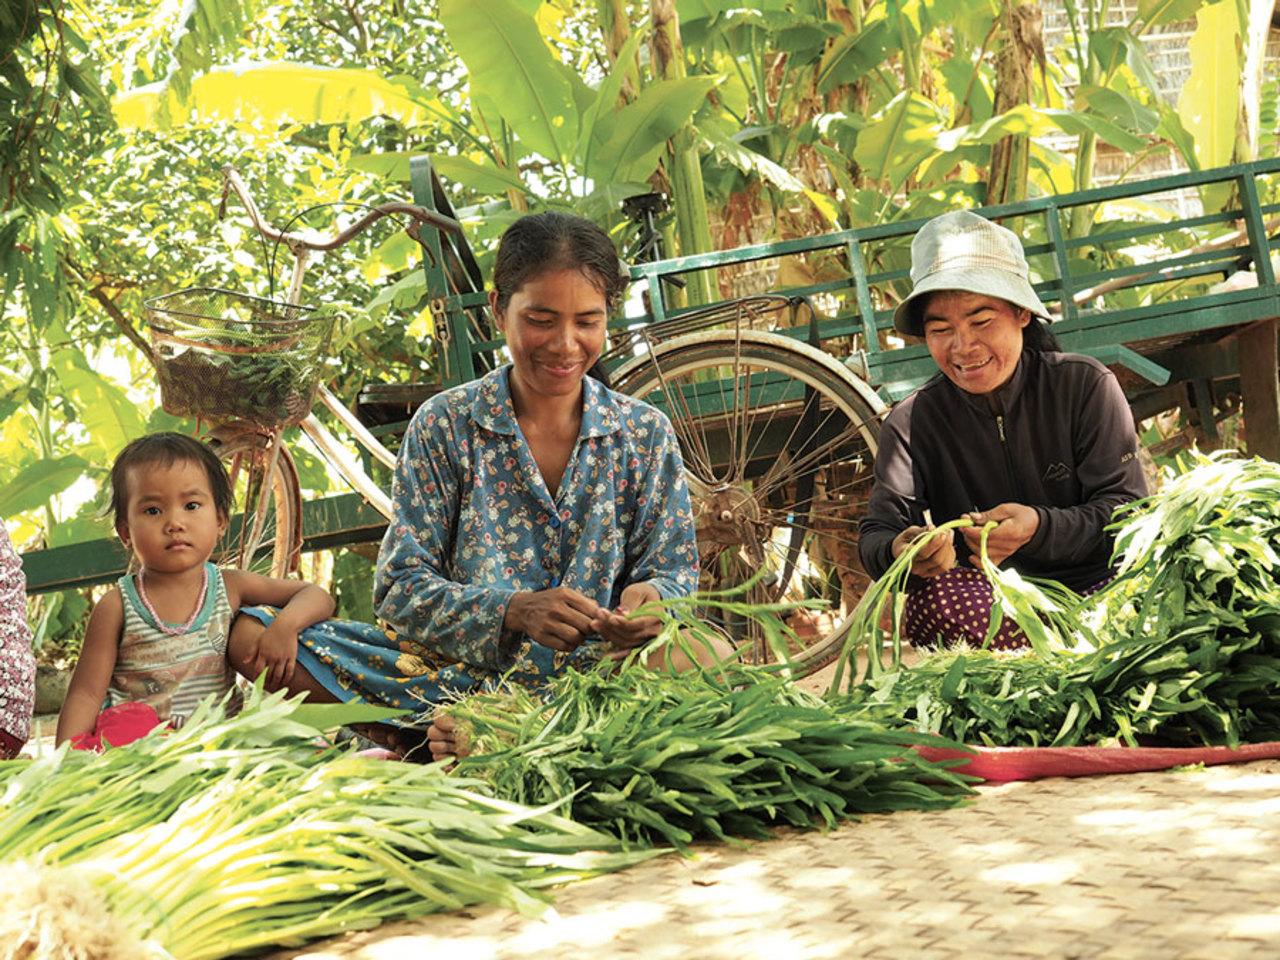 Agriculture familiale agroecologique asie miimosa